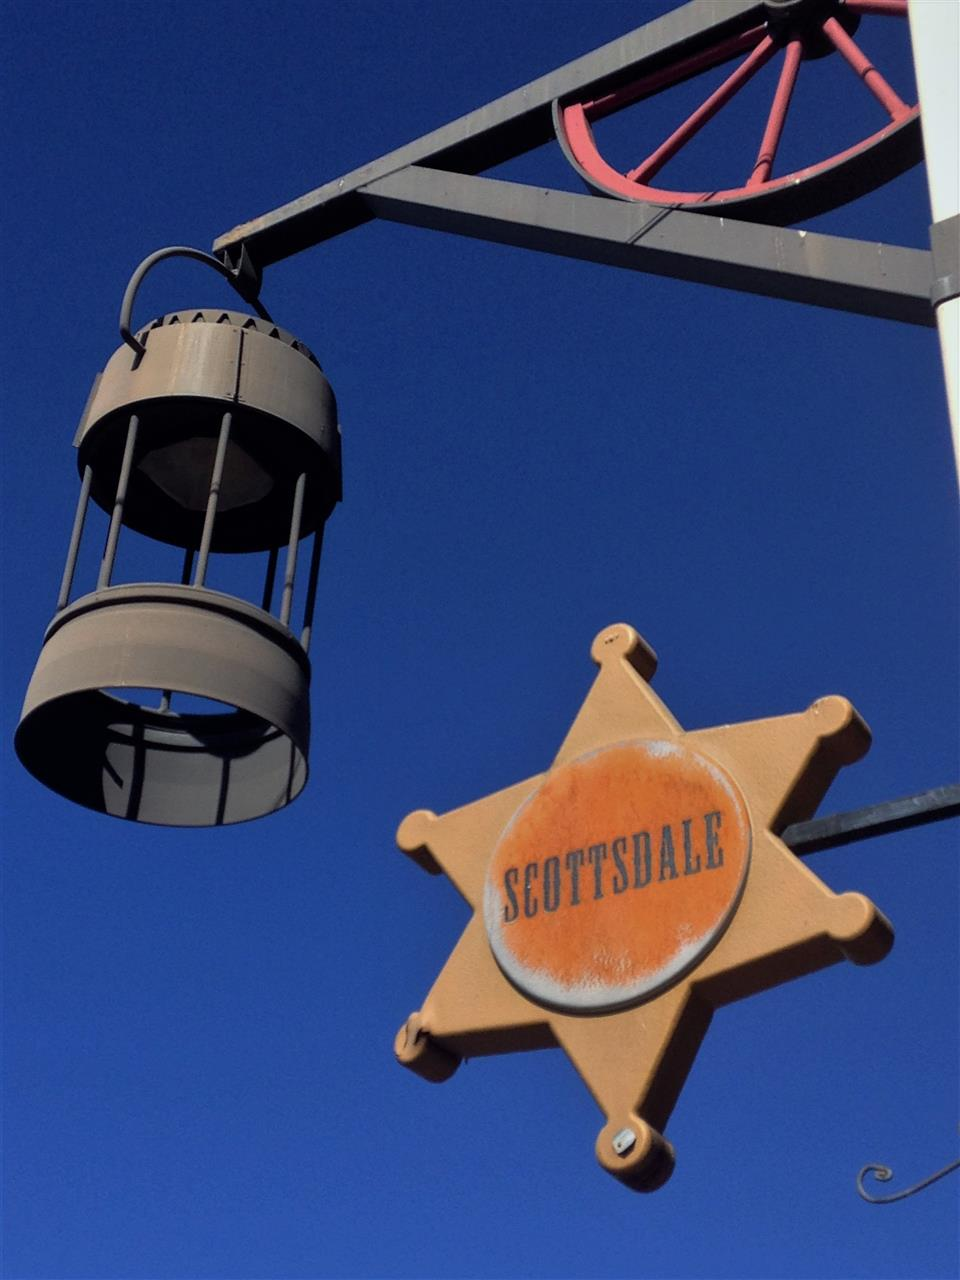 The blue skies of Scottsdale, AZ